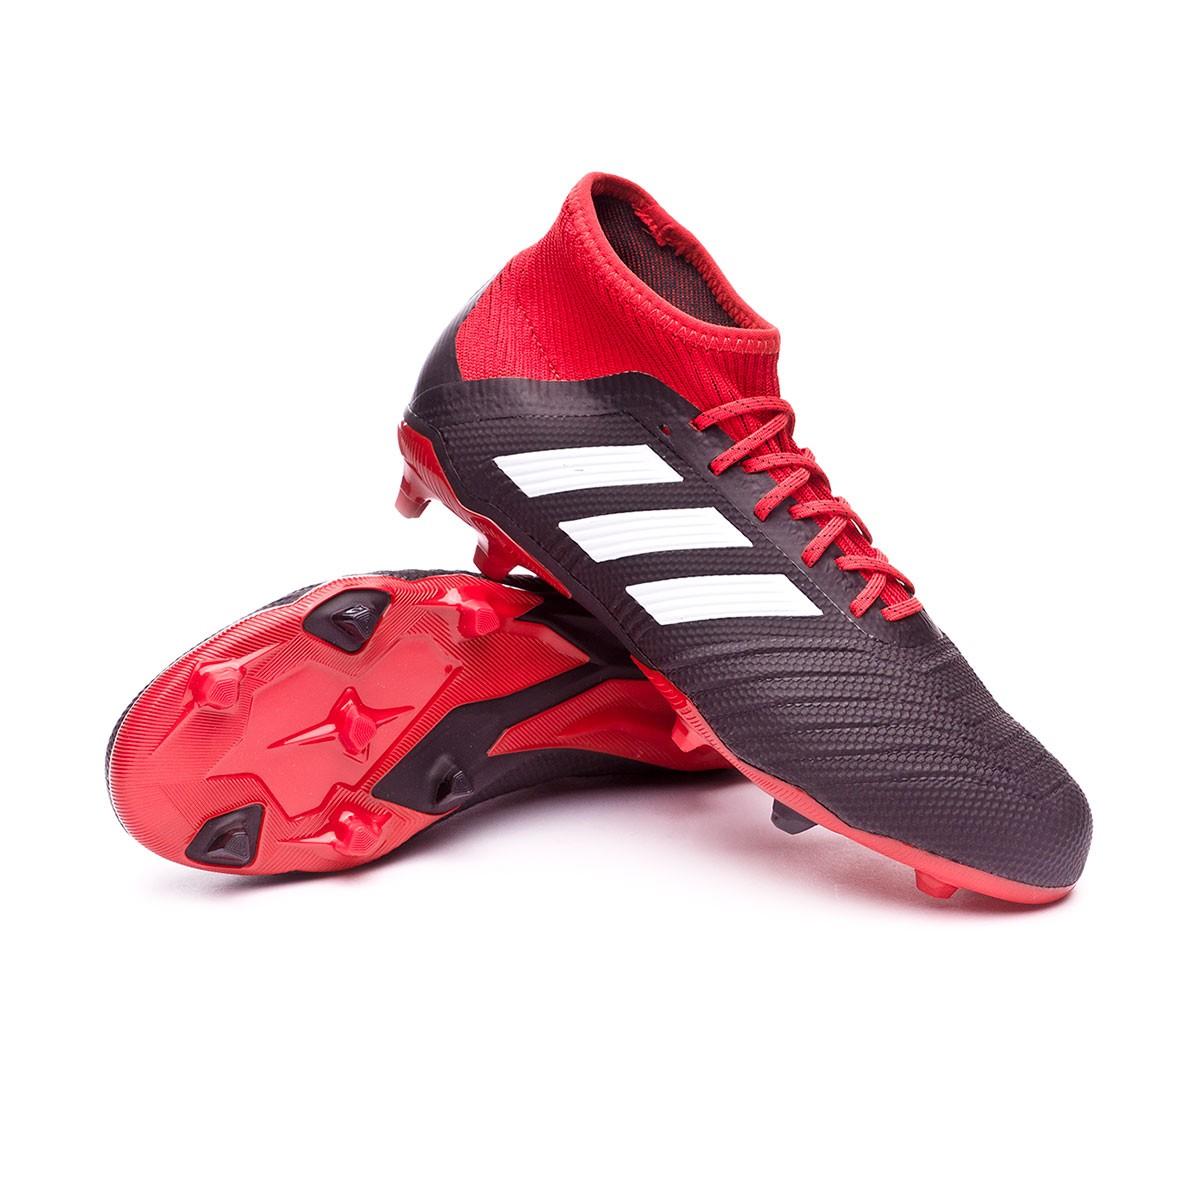 0e4558ef0 Football Boots adidas Kids Predator 18.1 FG Core black-White-Red - Tienda  de fútbol Fútbol Emotion